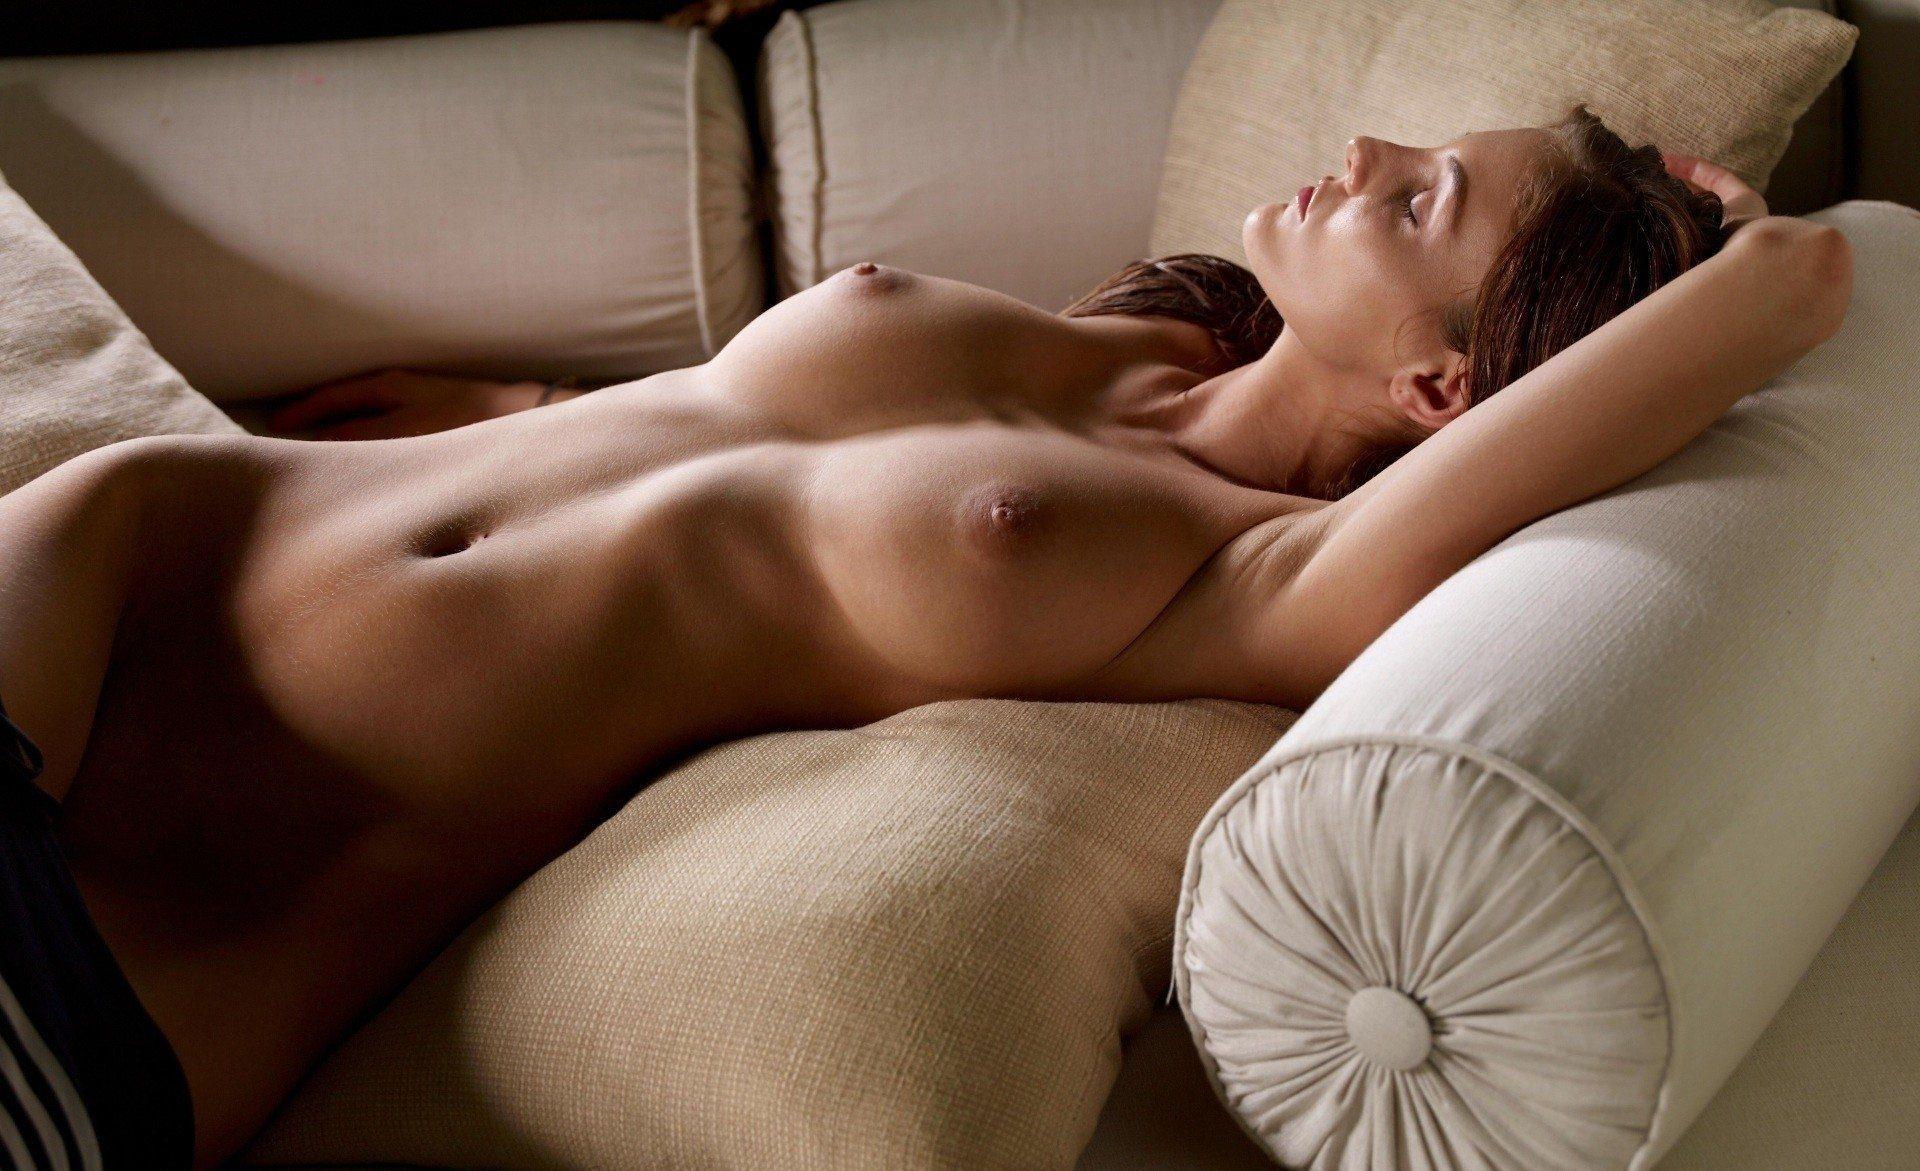 Woman nude sleep sexy butt black stock photo